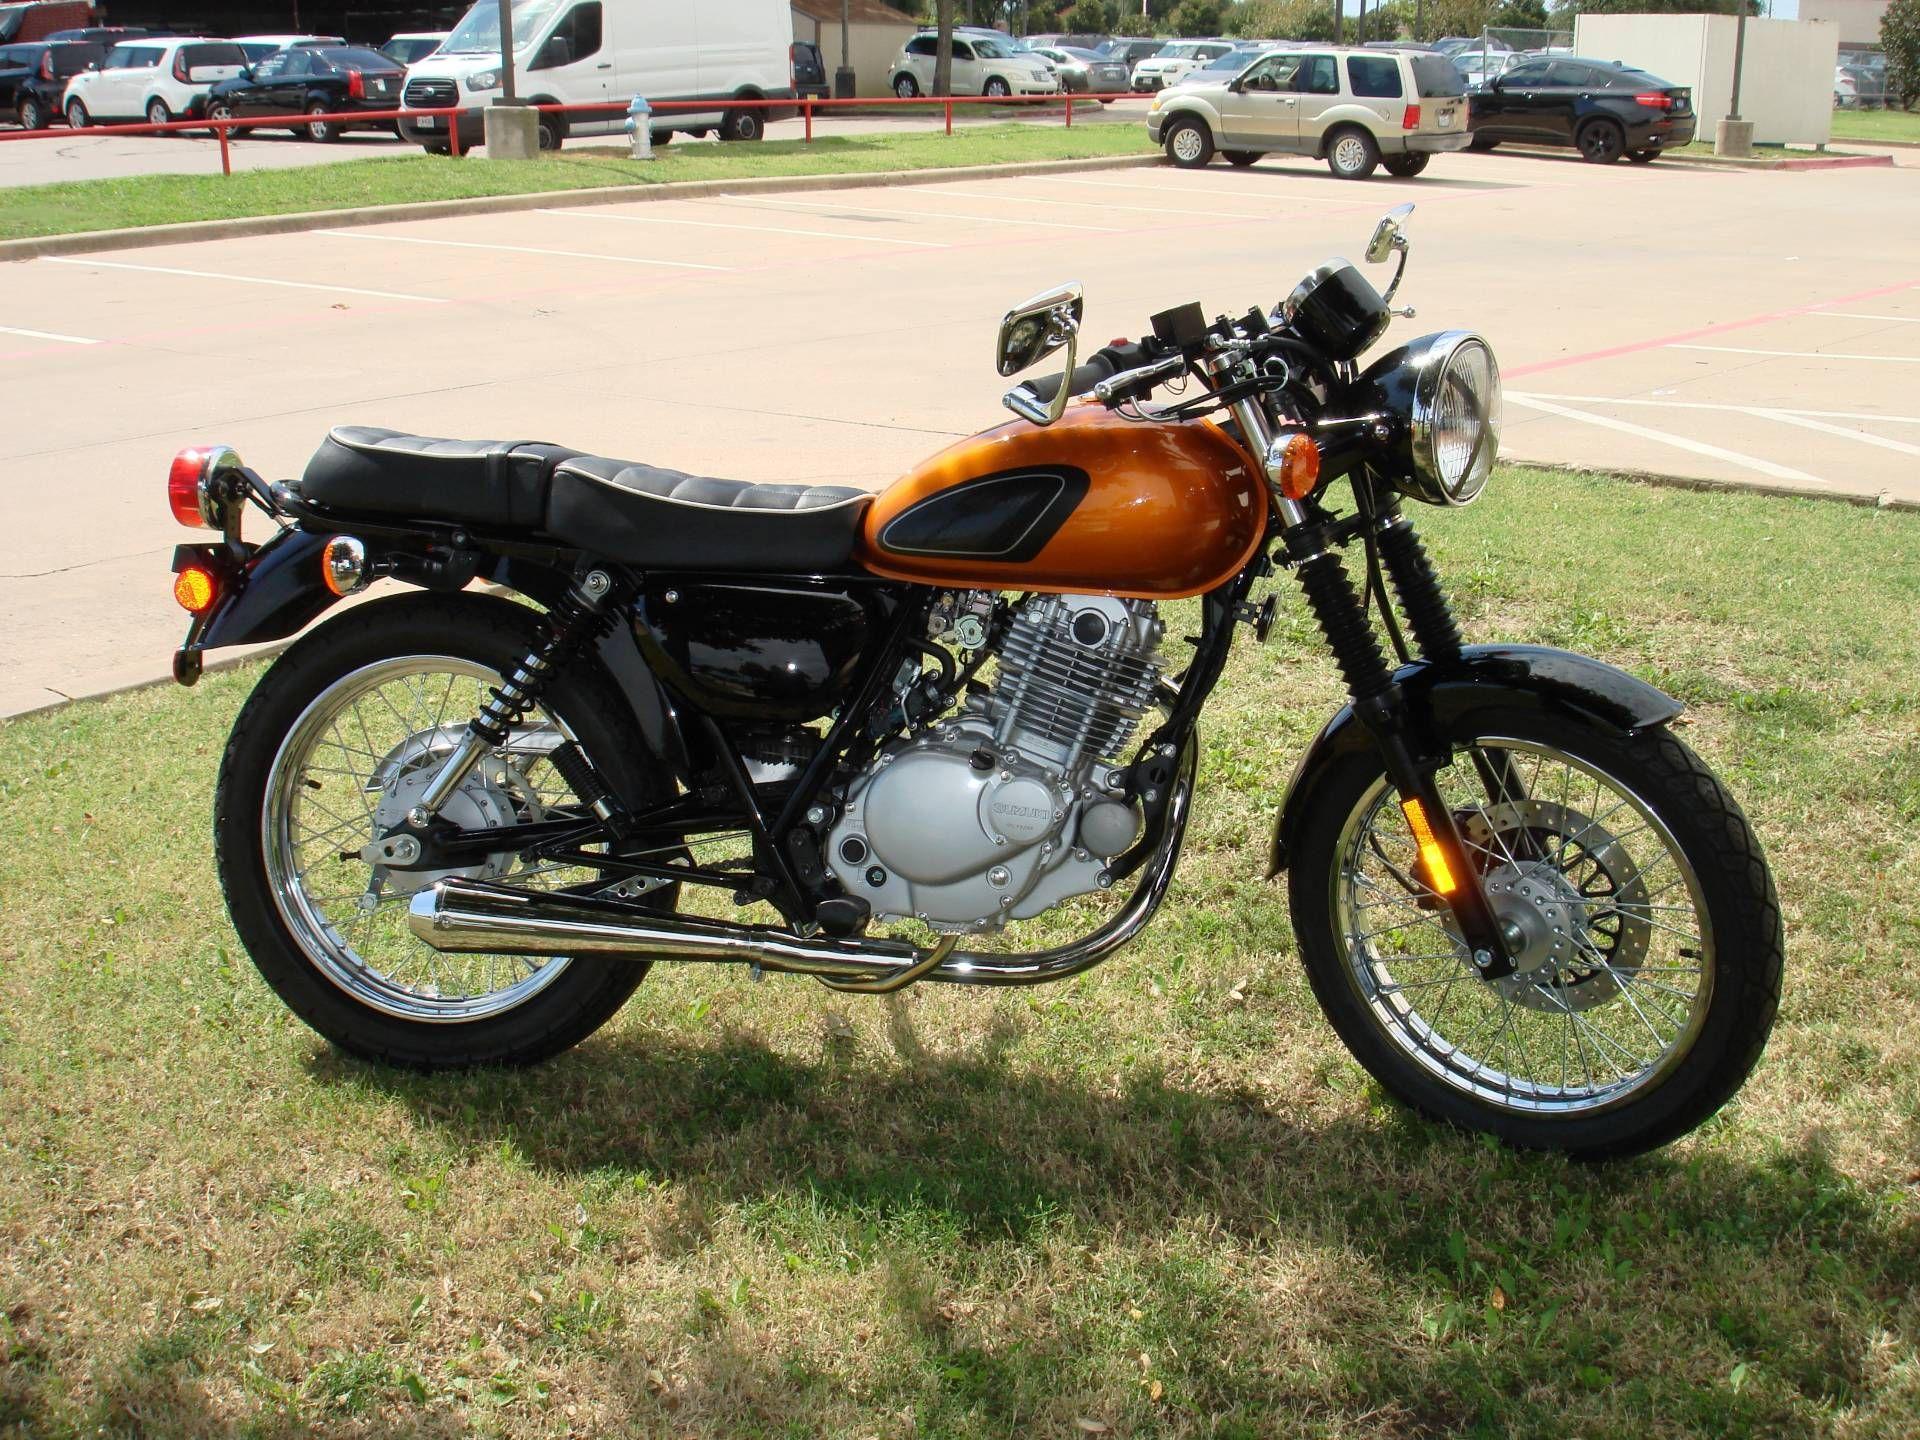 New 2016 Suzuki Tu250x Plano For Sale 5 Vintage Motorcycles Cafe Racing Motorcycle